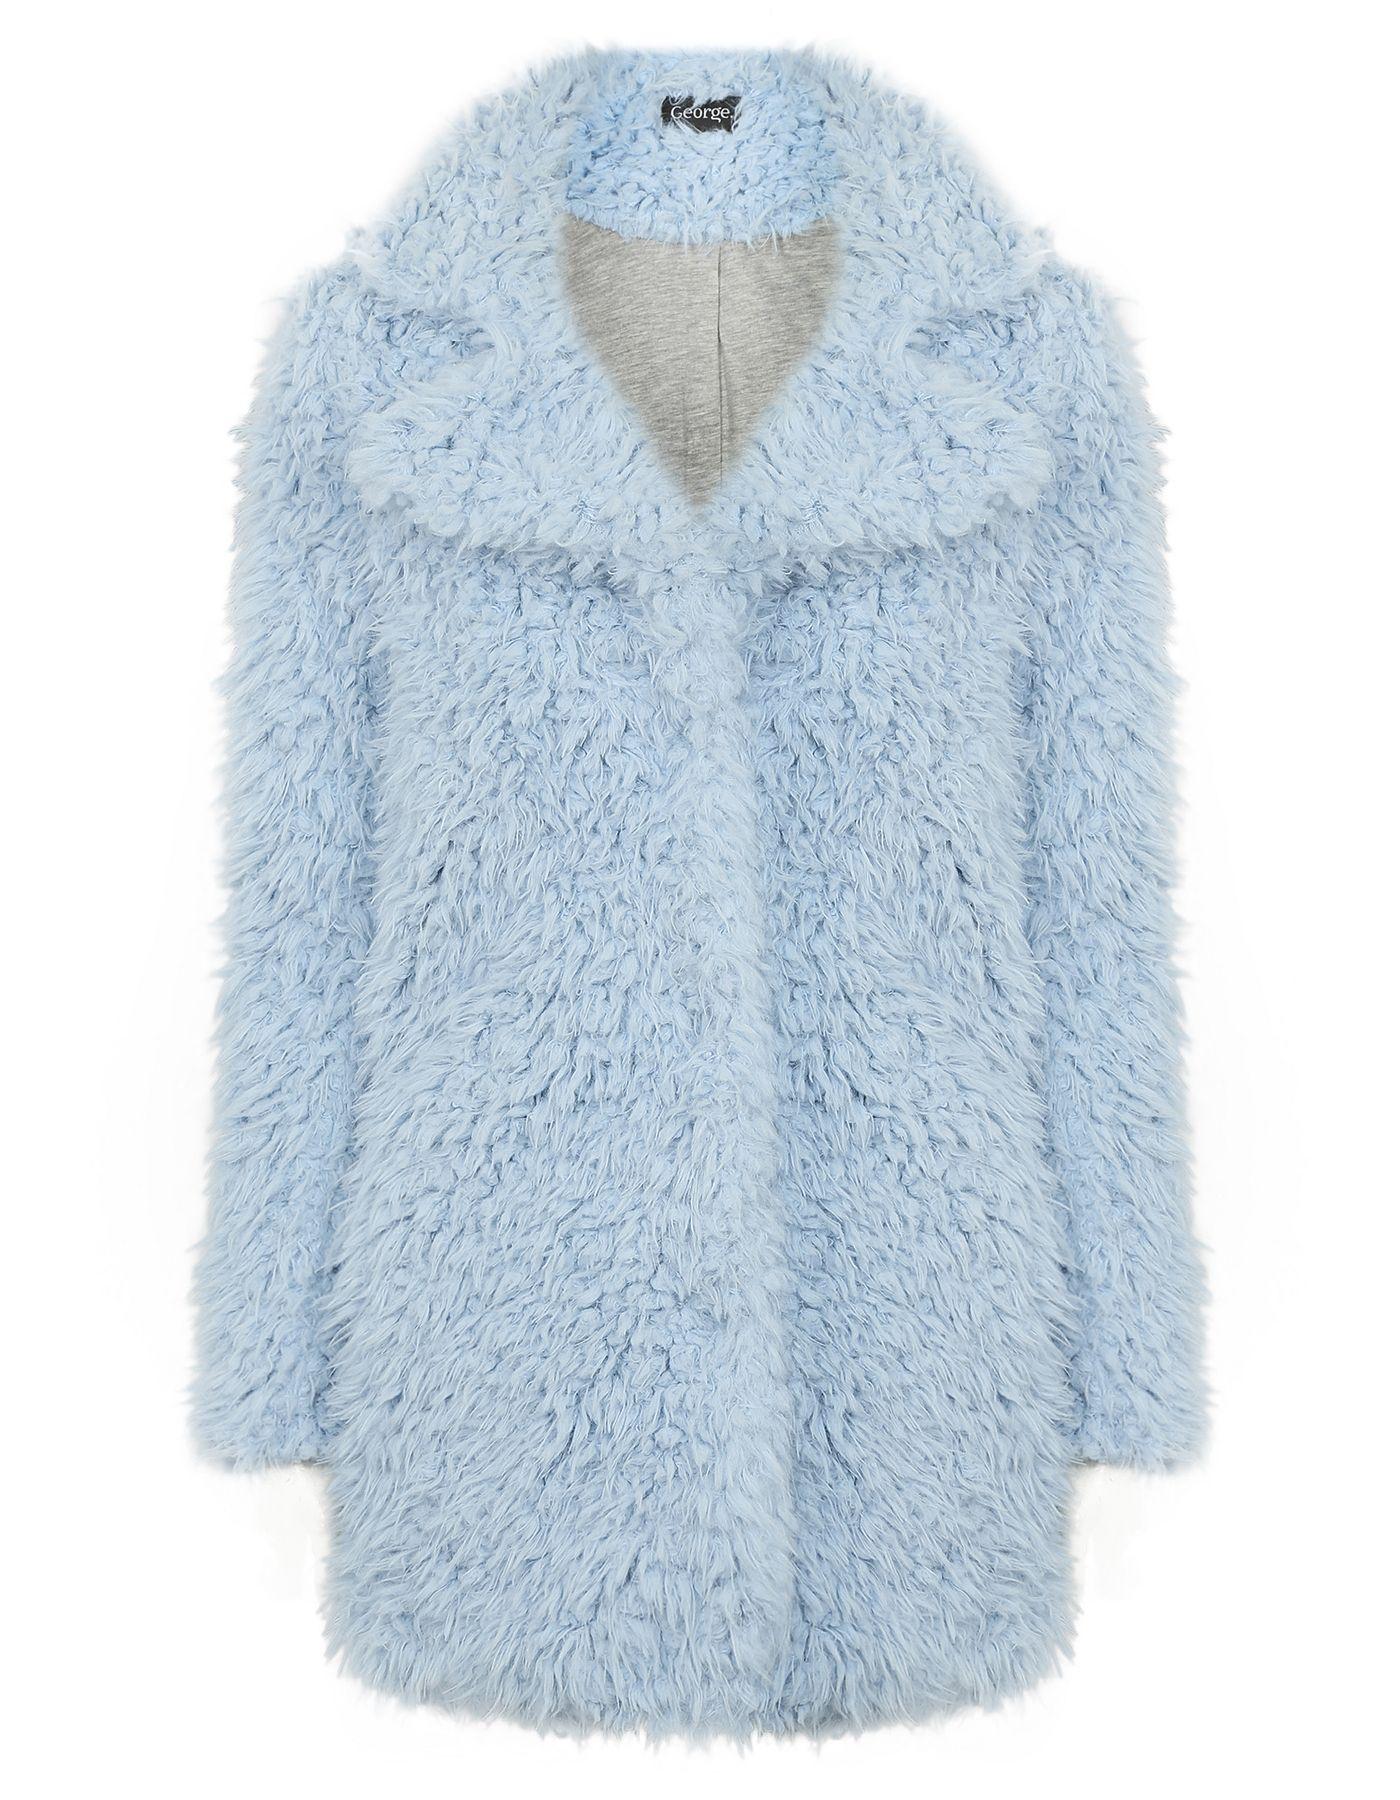 20bda17a2 Teddy Coat